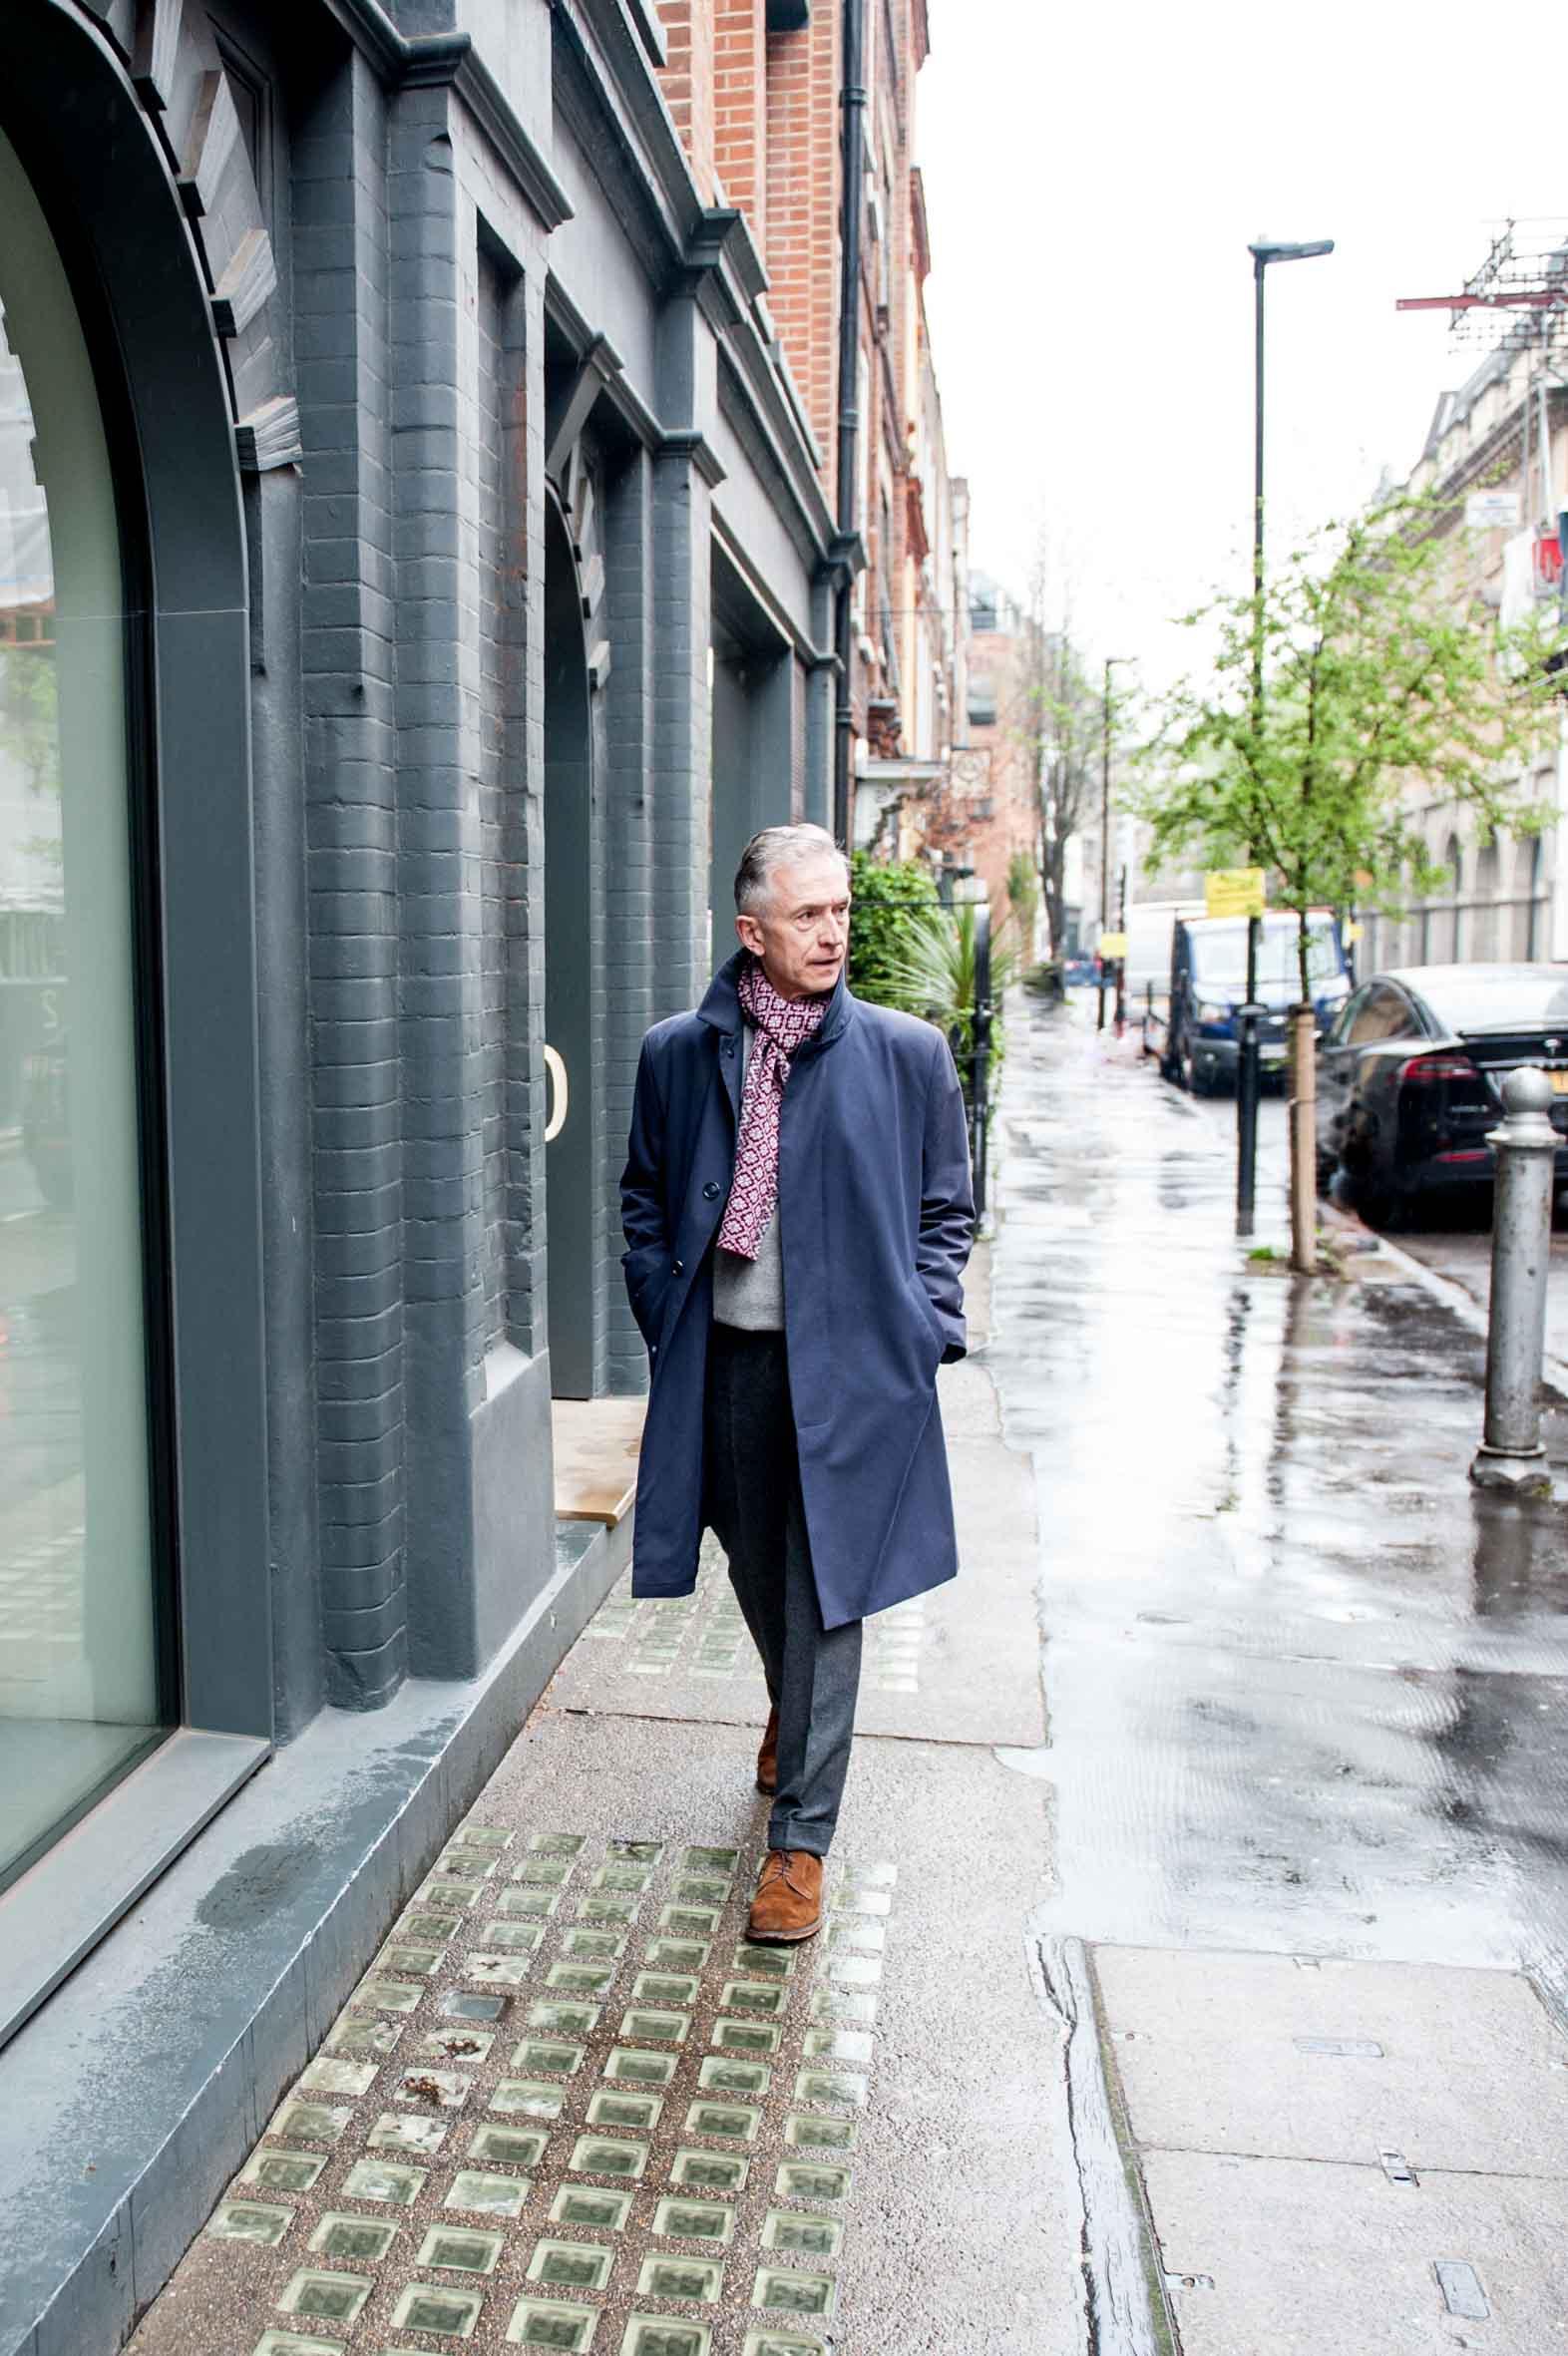 susannah-hall-tailors-bespoke-flannel-perfect-trousers-harrisons-cloth-ventile-raincoat-made-britain.jpg